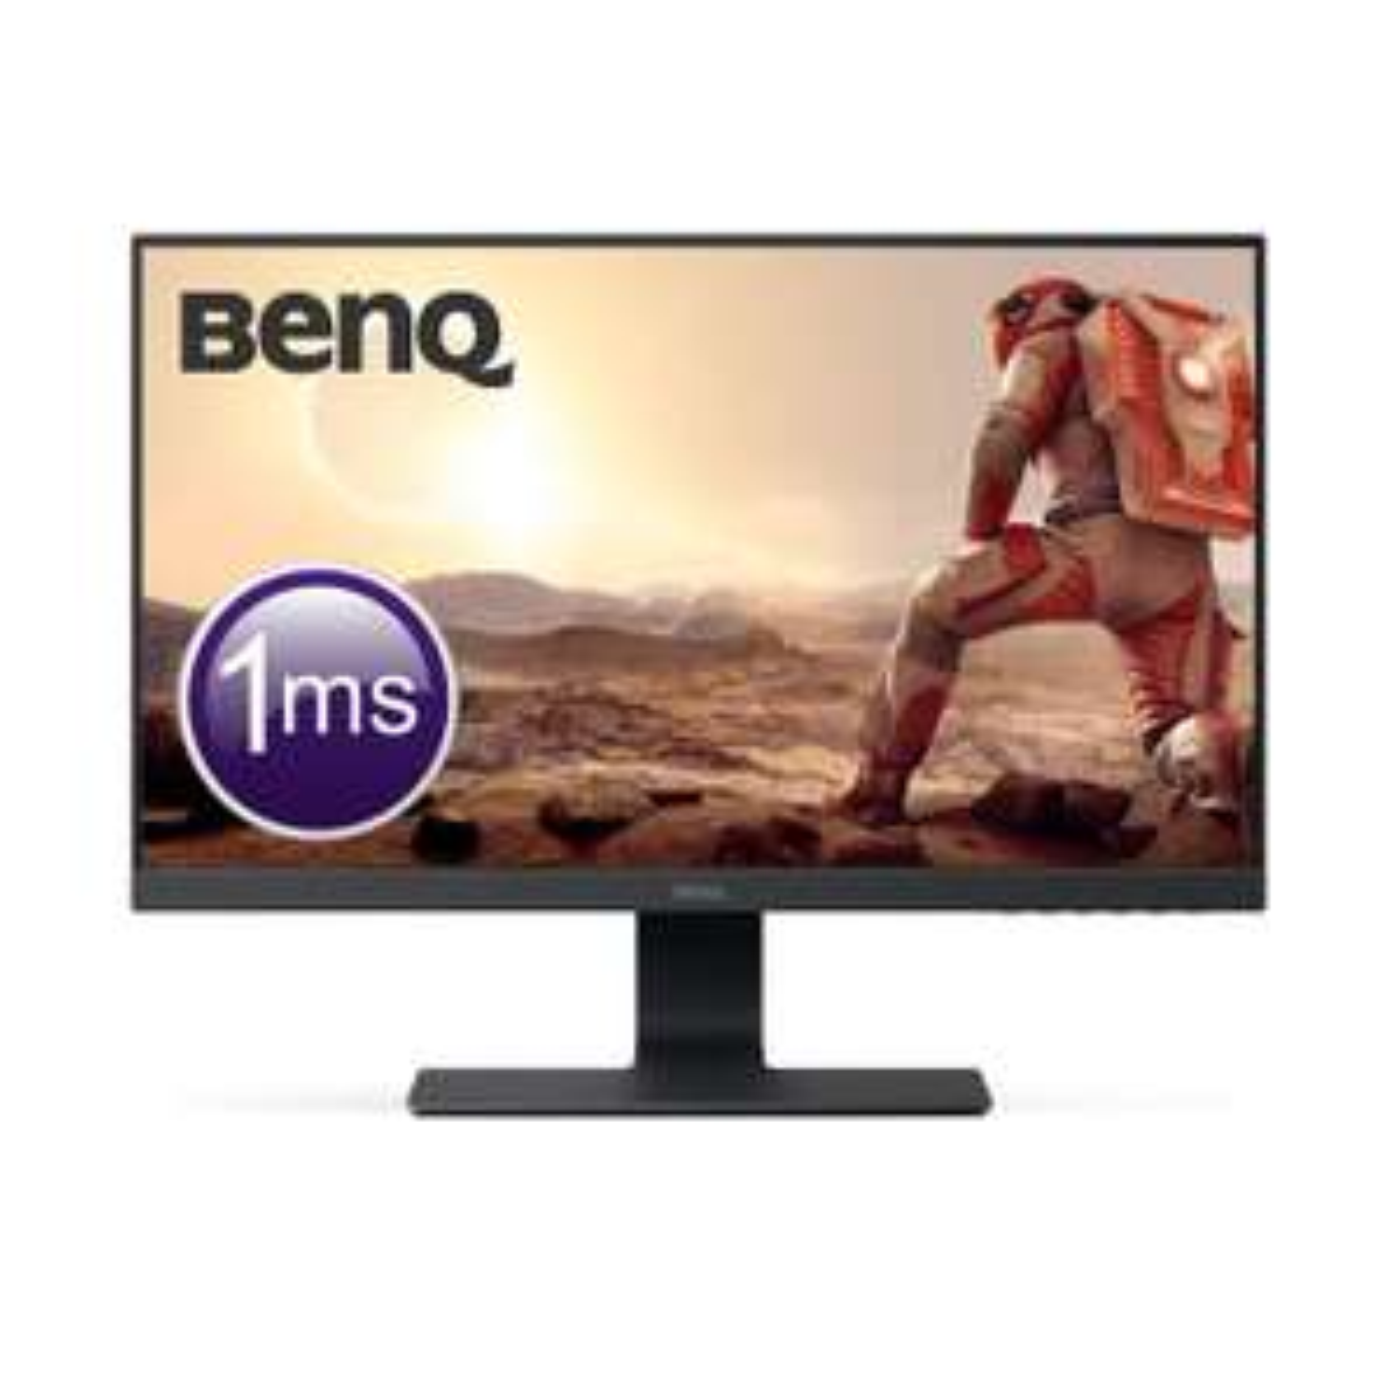 BenQ GL2580H 24.5 Inch FHD 1080p 1 ms Eye-Care LED Gaming Monitor, HDMI , Black £87.99 @ Amazon Prime